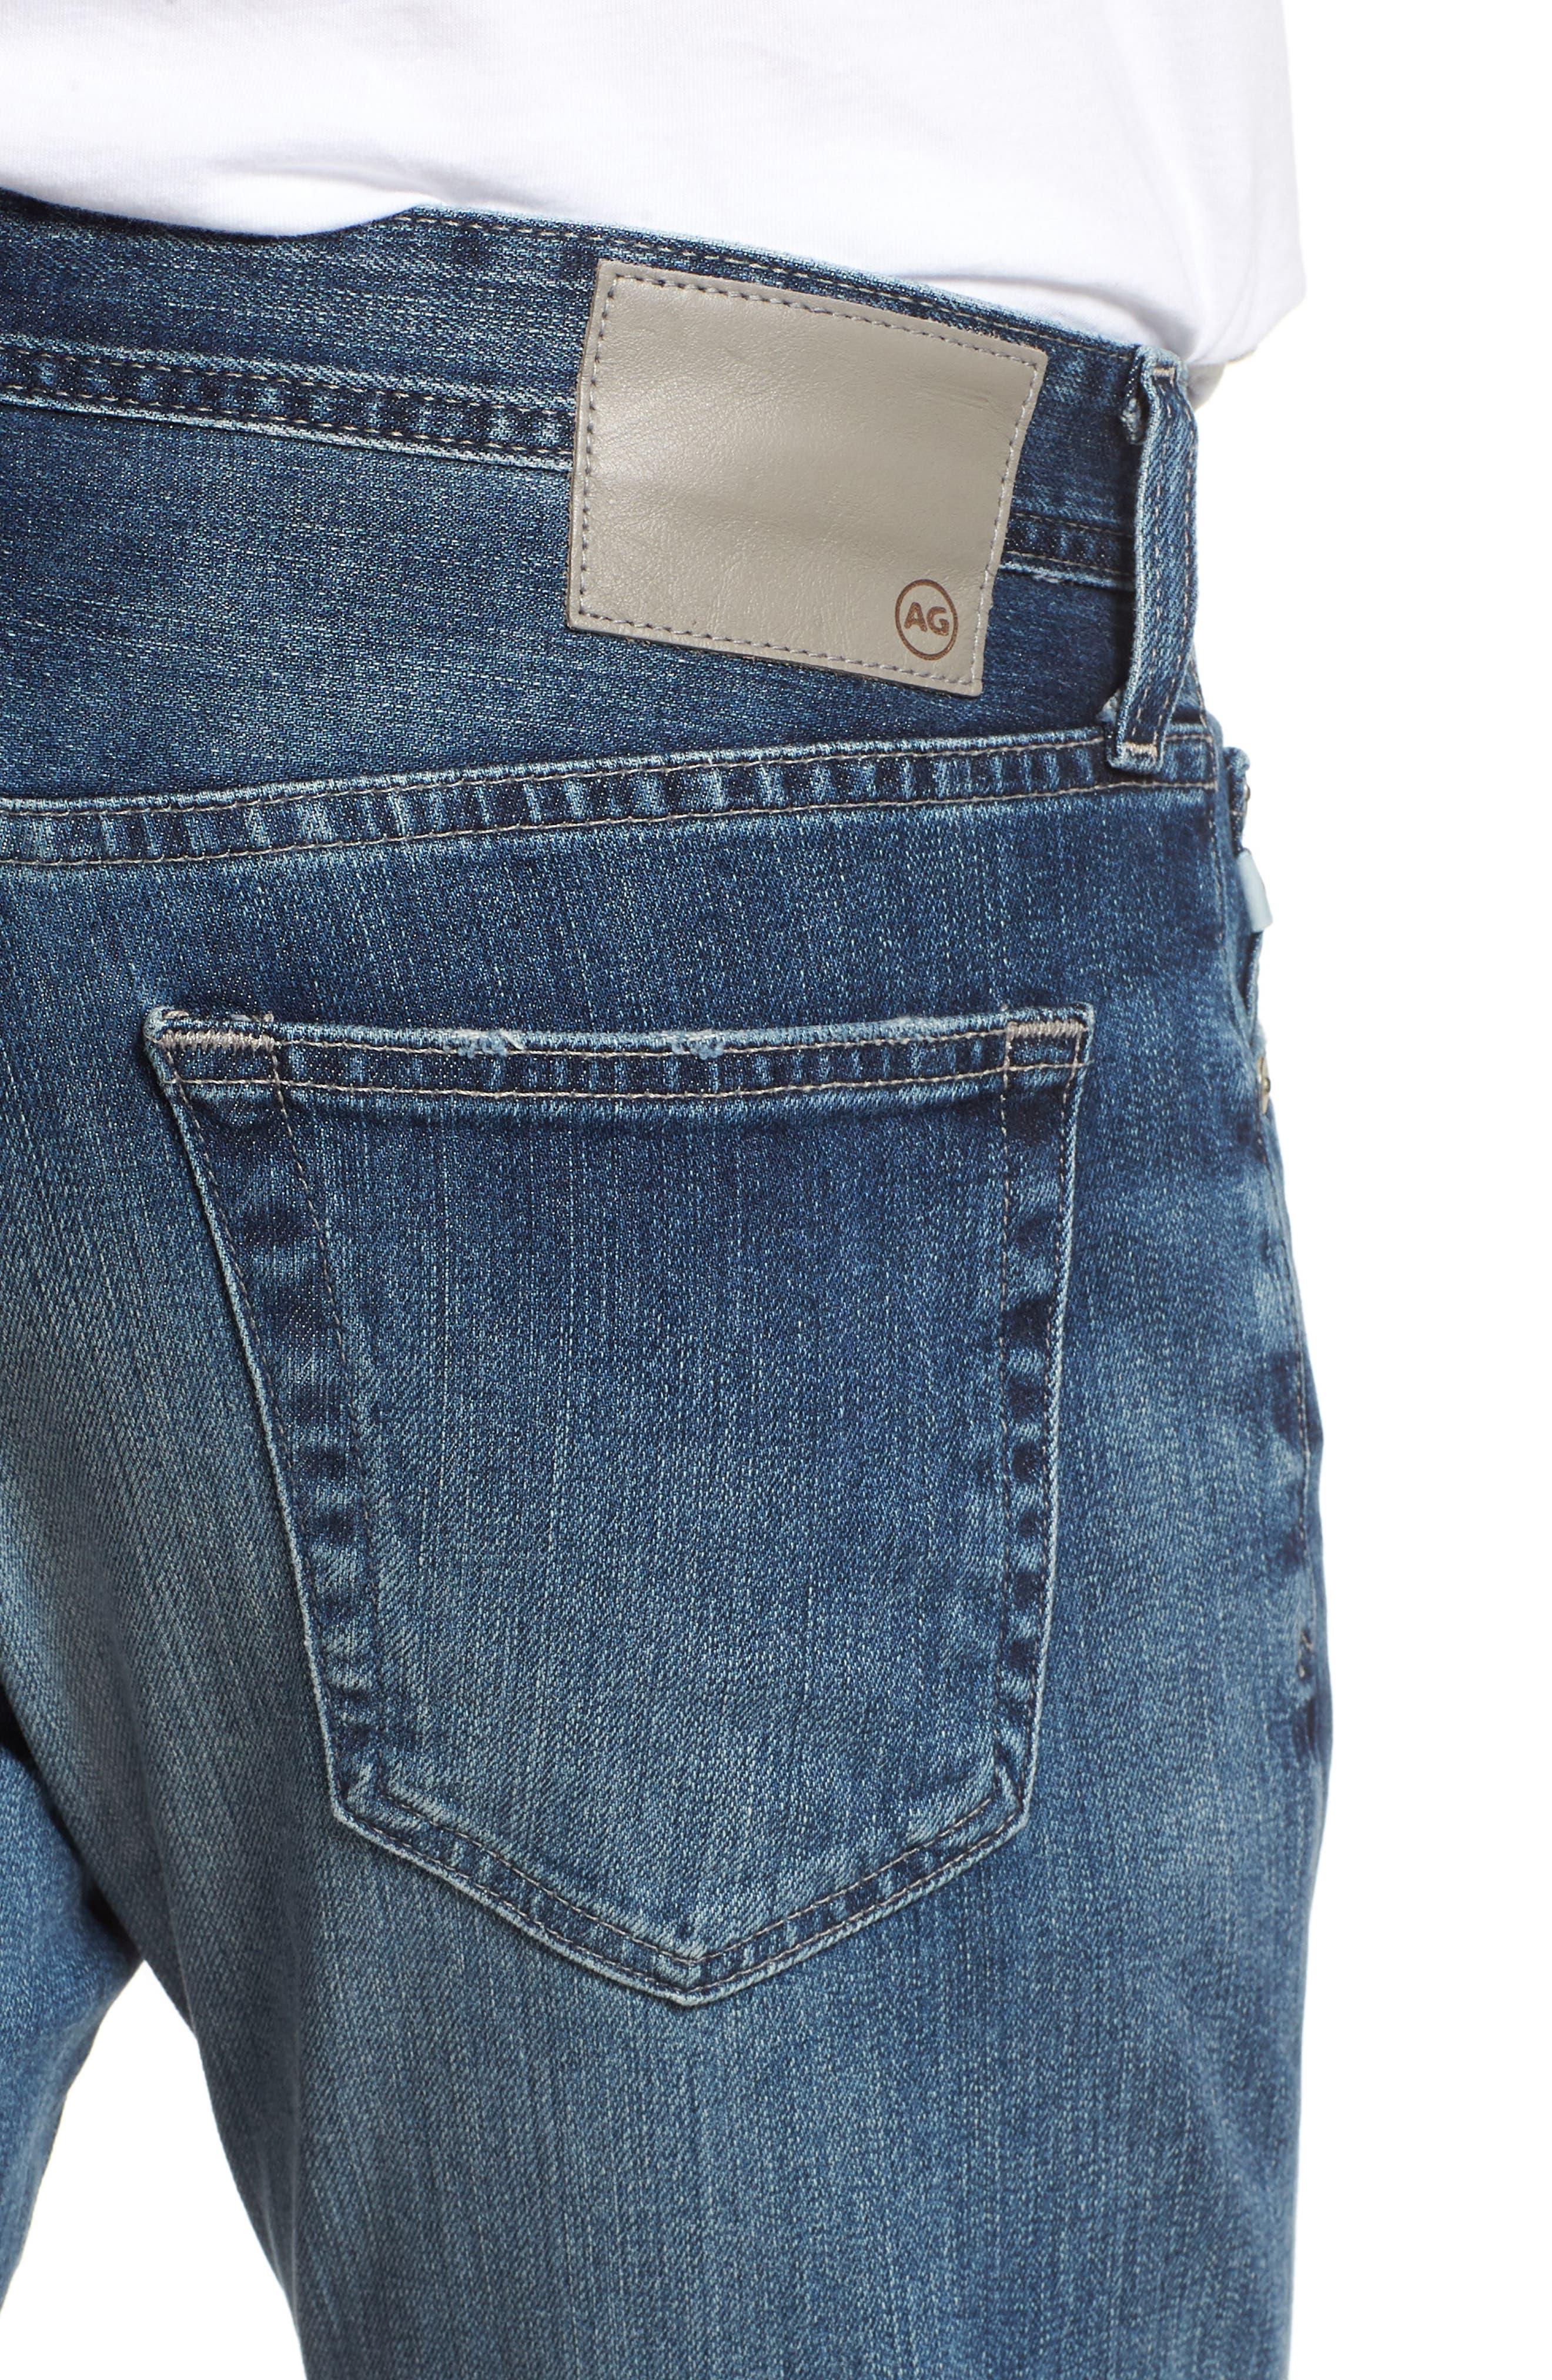 Tellis Slim Fit Jeans,                             Alternate thumbnail 4, color,                             12 YEARS MAVERICKS